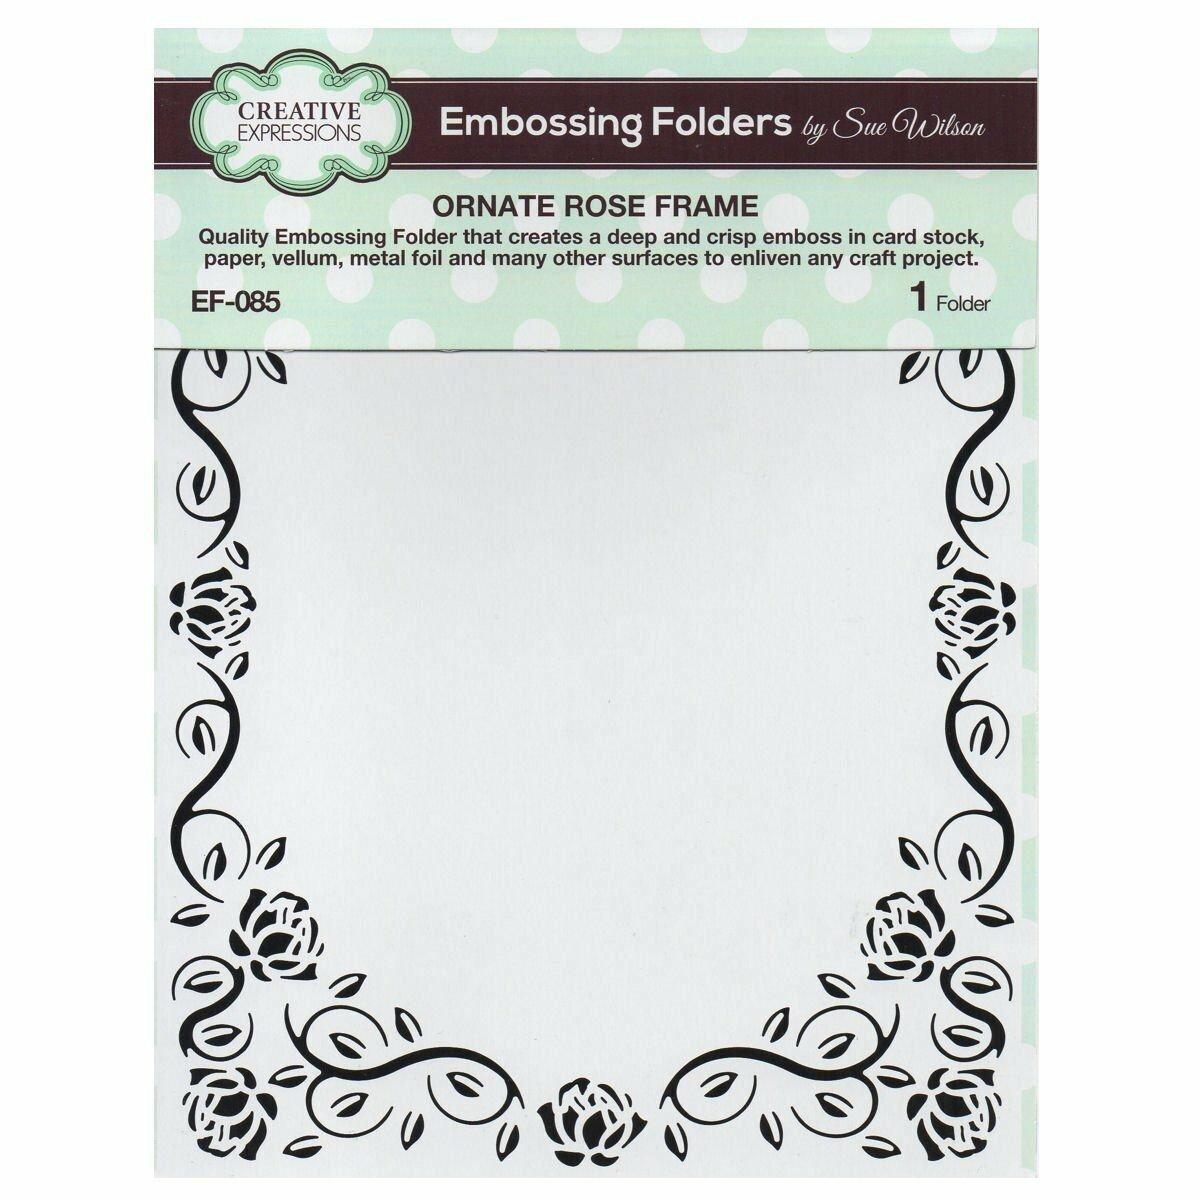 Creative Expressions Embossing Folder ~ Ornate Rose Frame, 5.3/4X7.5